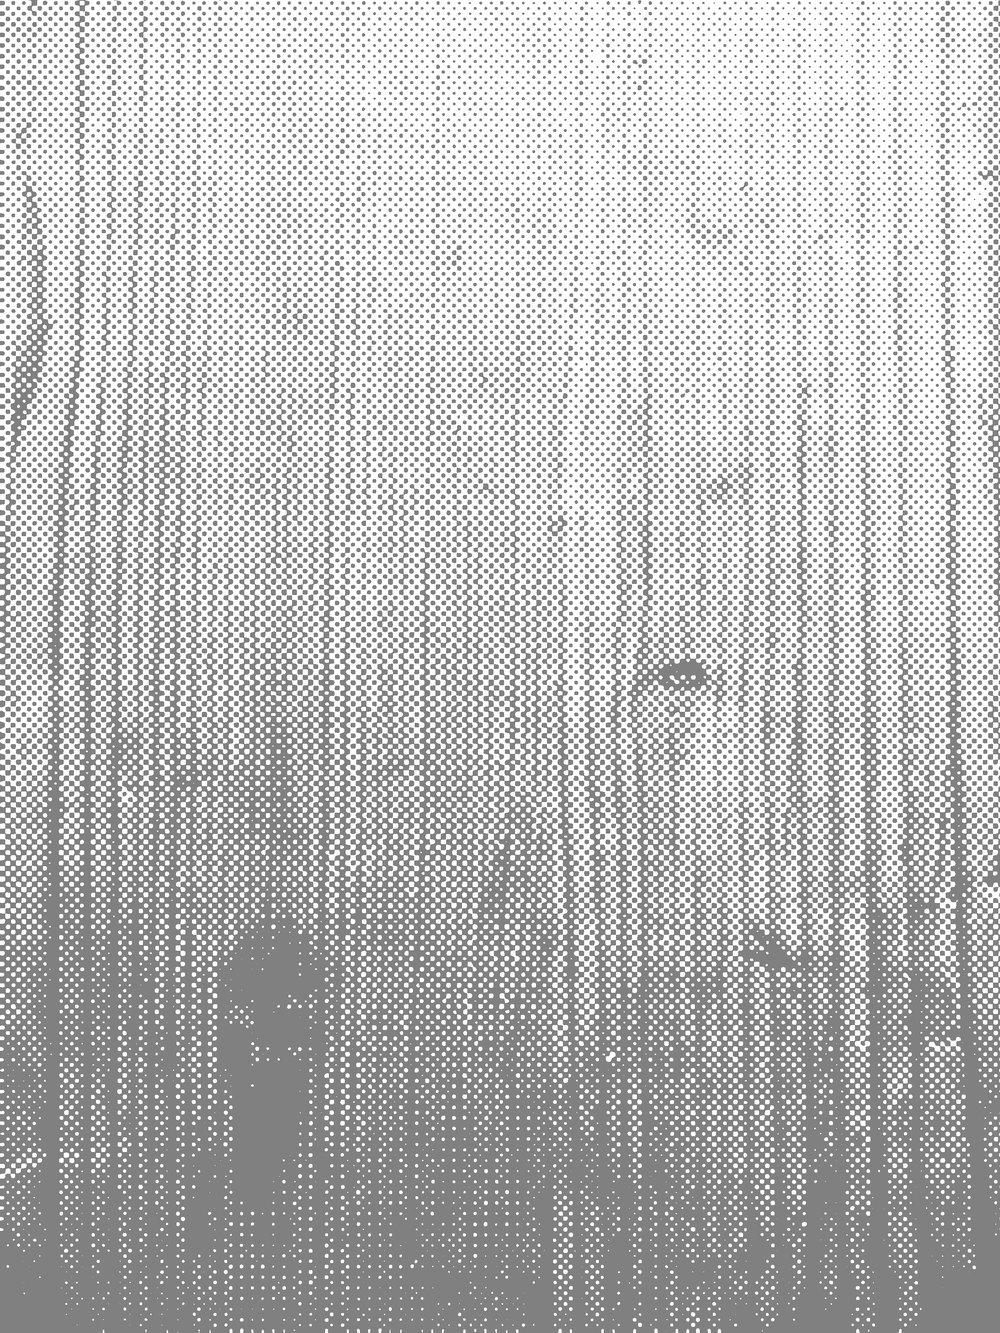 wood_halftone.jpg